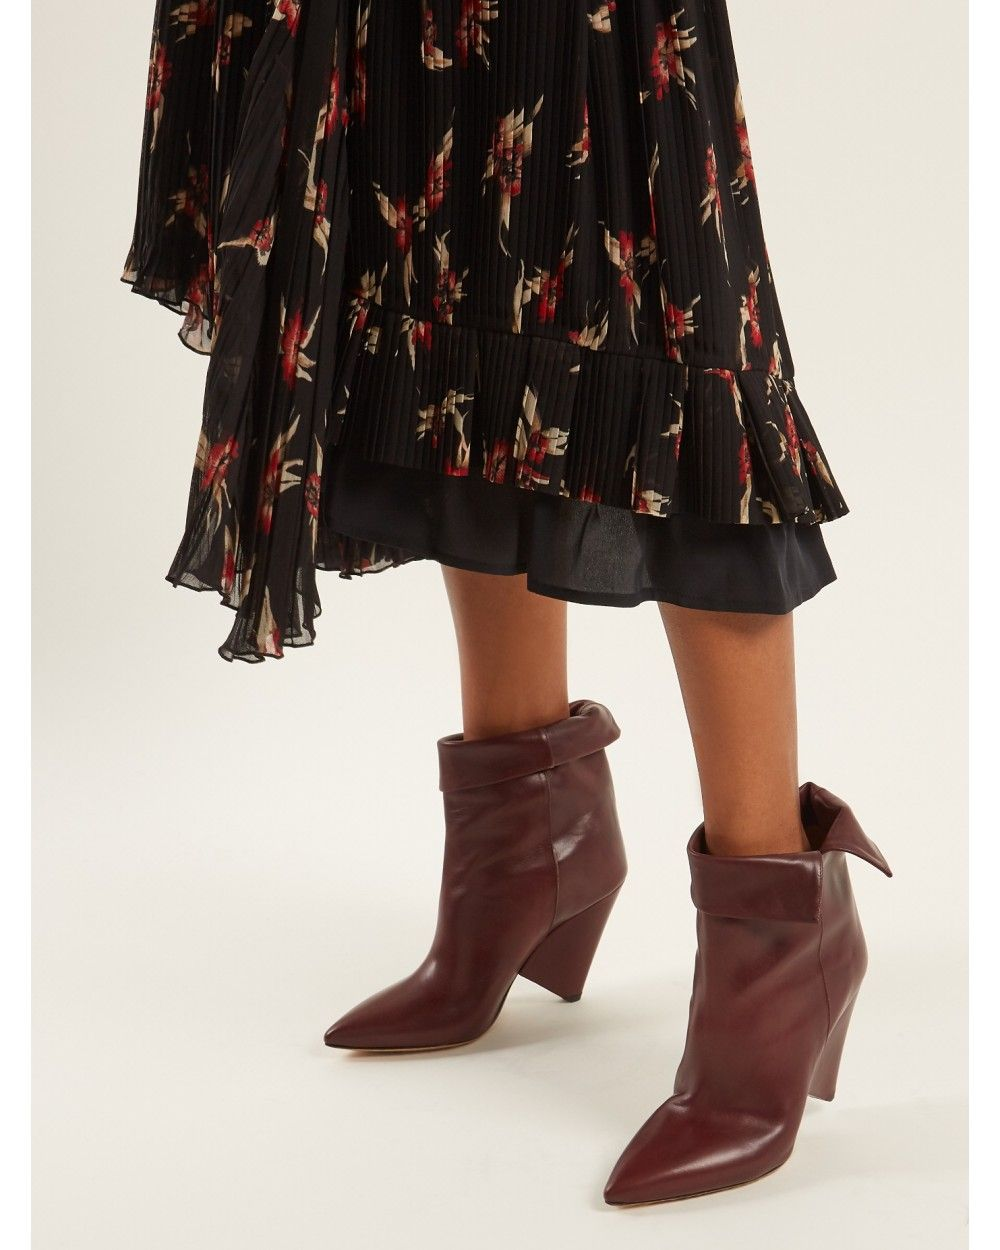 05917aa4d6c Isabel Marant Luliana Leather Ankle Boots Burgundy - Isabel Marant  #ISABELMARANT #fashion #women #fashionshoes #shoes #lifestyle #gifts  #womenfashion